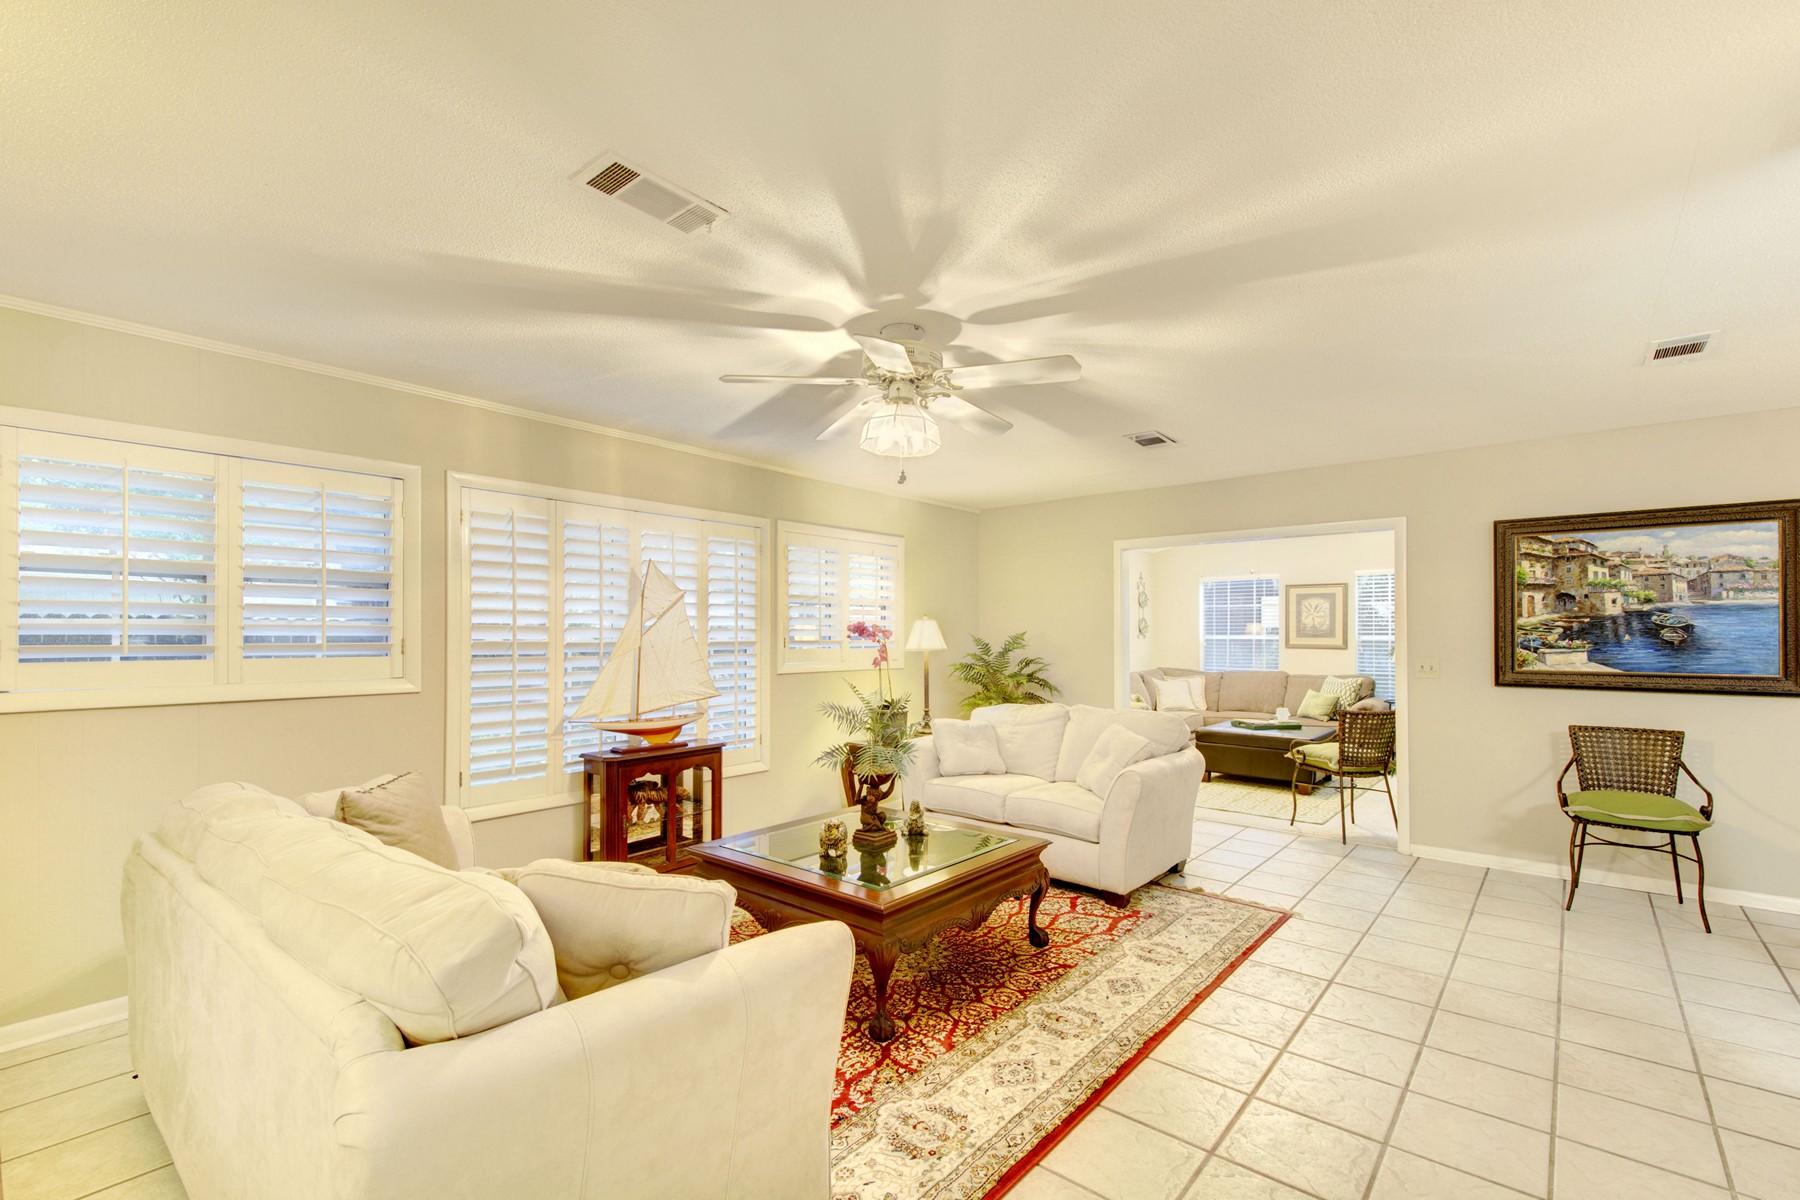 واحد منزل الأسرة للـ Sale في 11908 Old Demere Road St. Simons Island, Georgia, 31522 United States